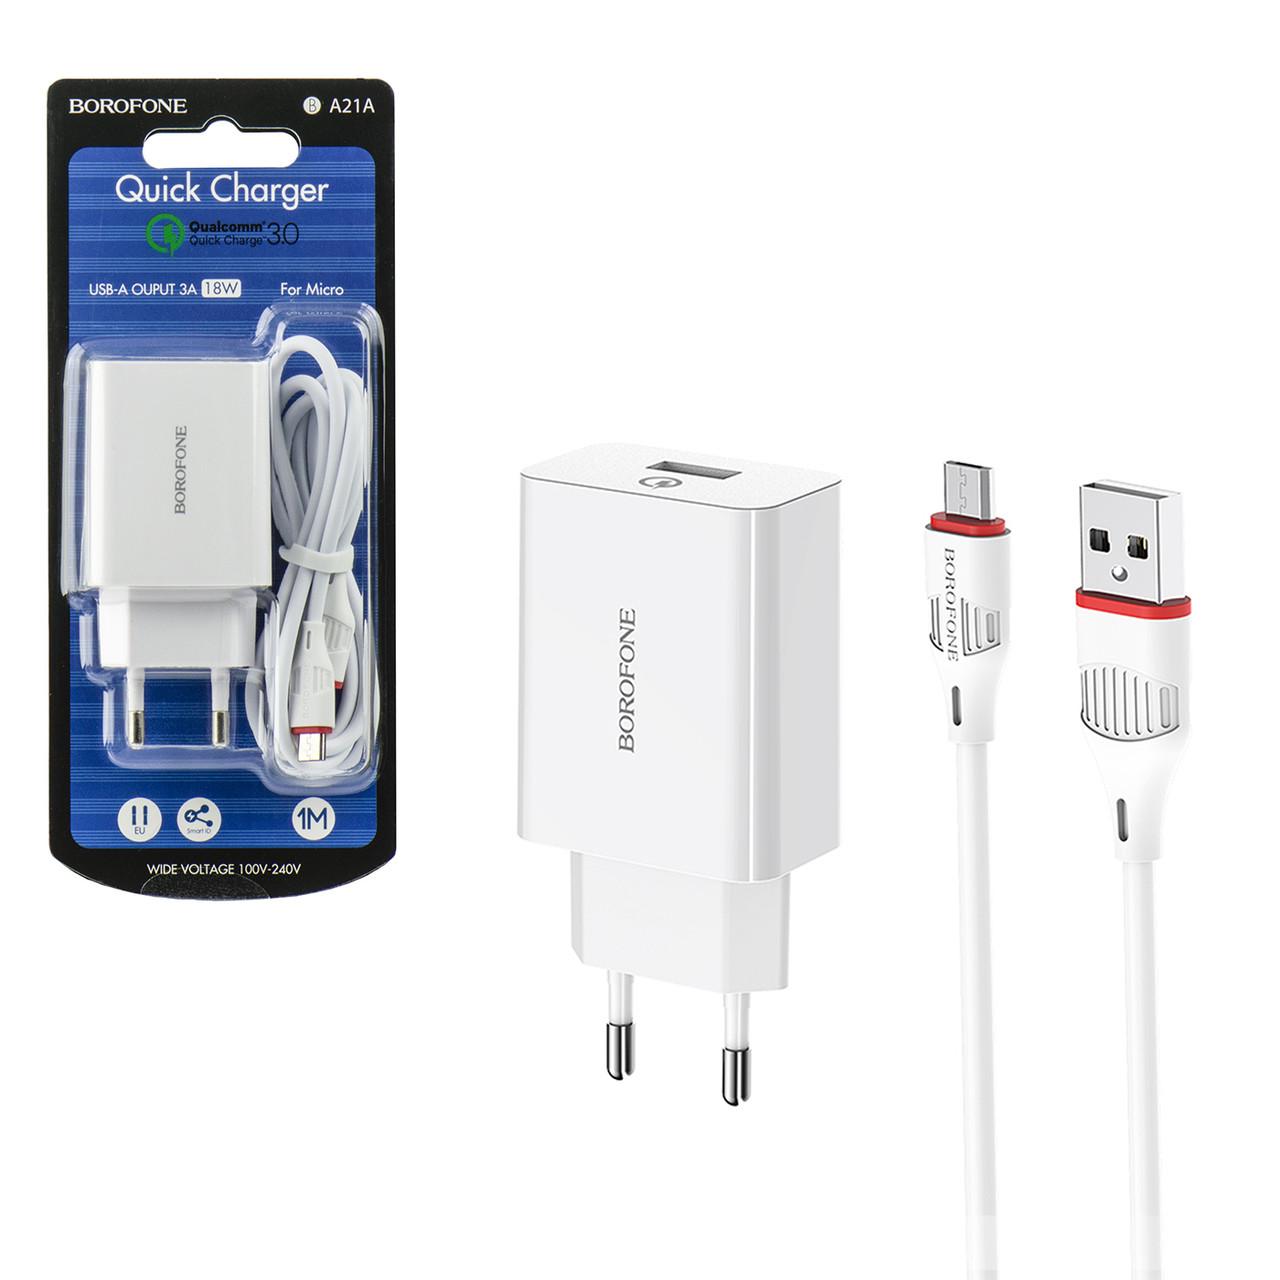 Сетевое зарядное устройство Borofone BA20A 1xUSB QC 3.0 + кабель micro usb, White